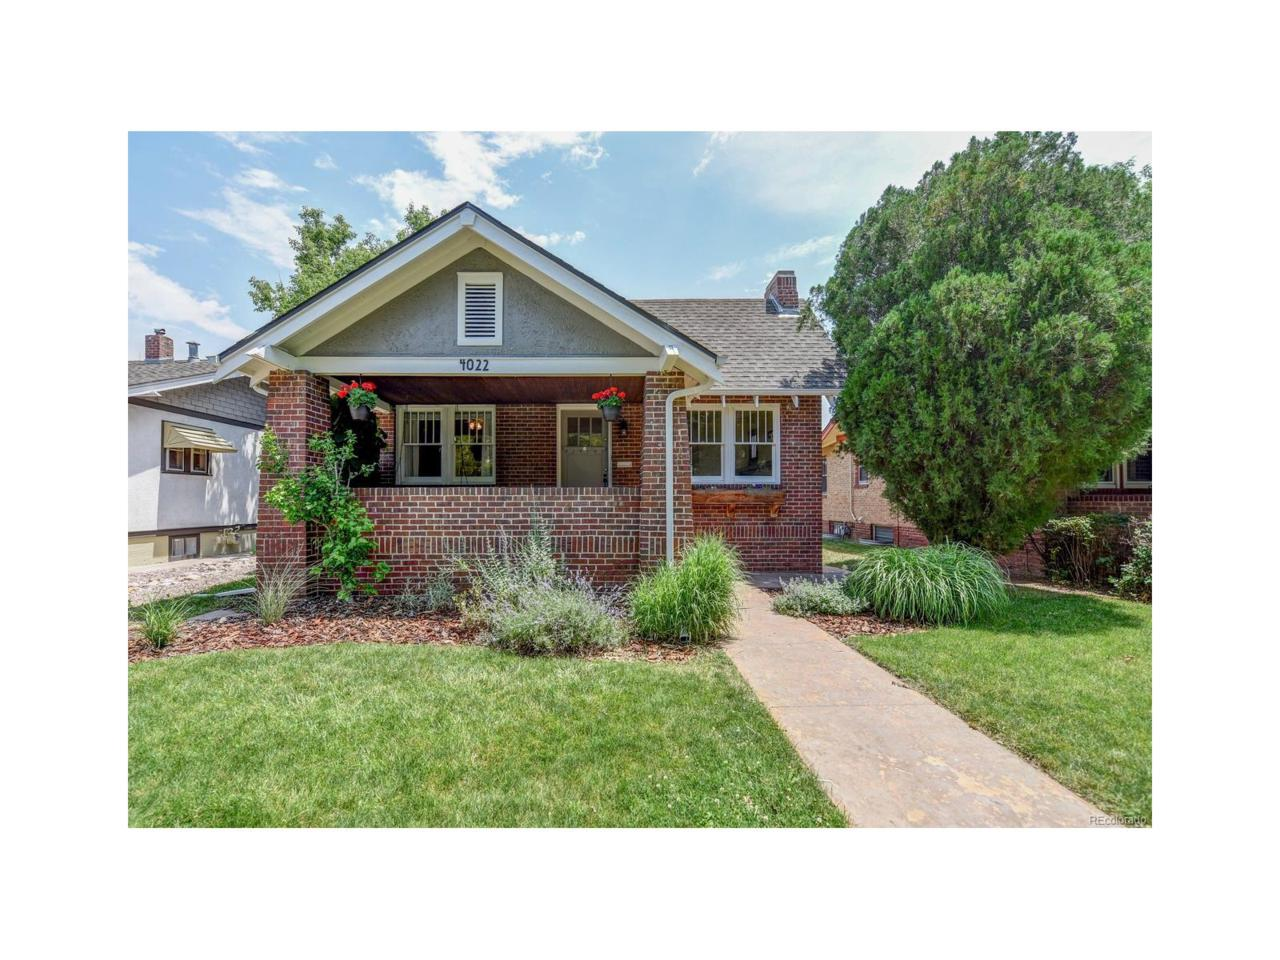 4022 Meade Street, Denver, CO 80211 (MLS #8893352) :: 8z Real Estate